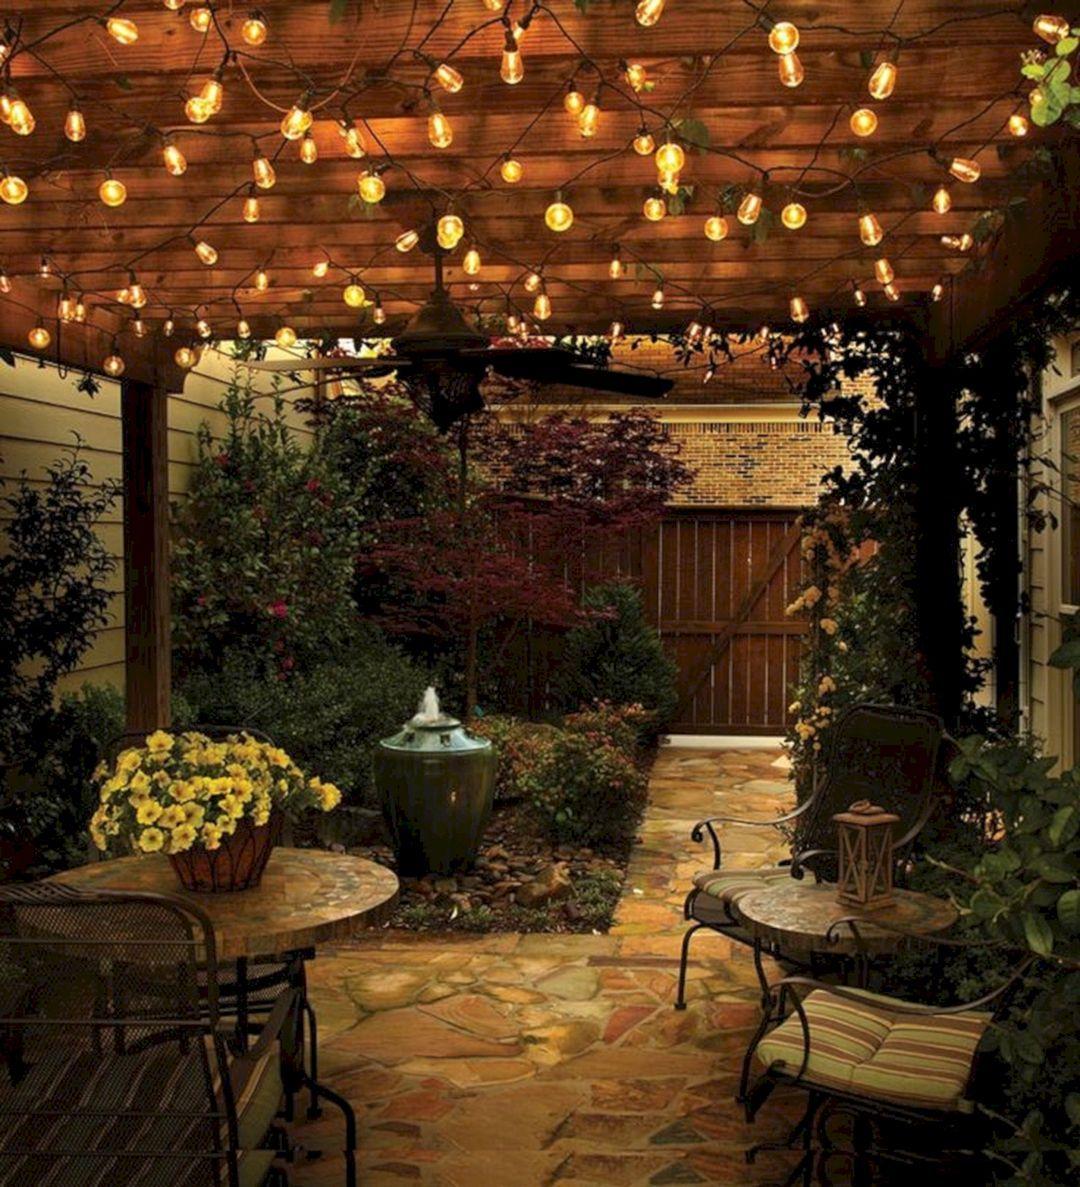 25+ Inspirational Garden Lighting Design For Amazing Garden Ideas